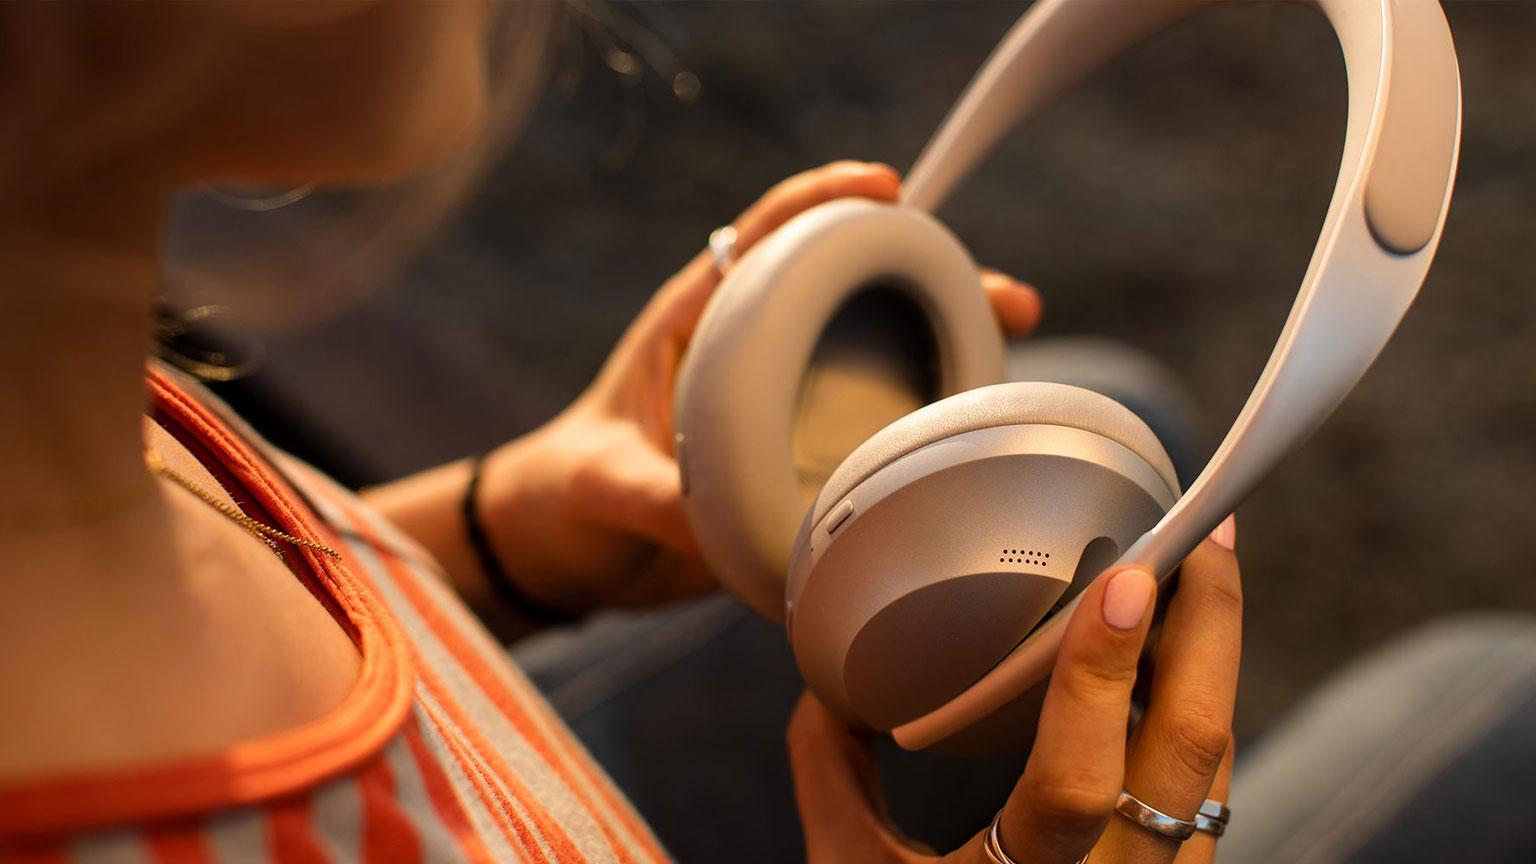 https://www.hitel.ir/wp-content/uploads/2020/03/Bose-Headphones-700-9.jpg